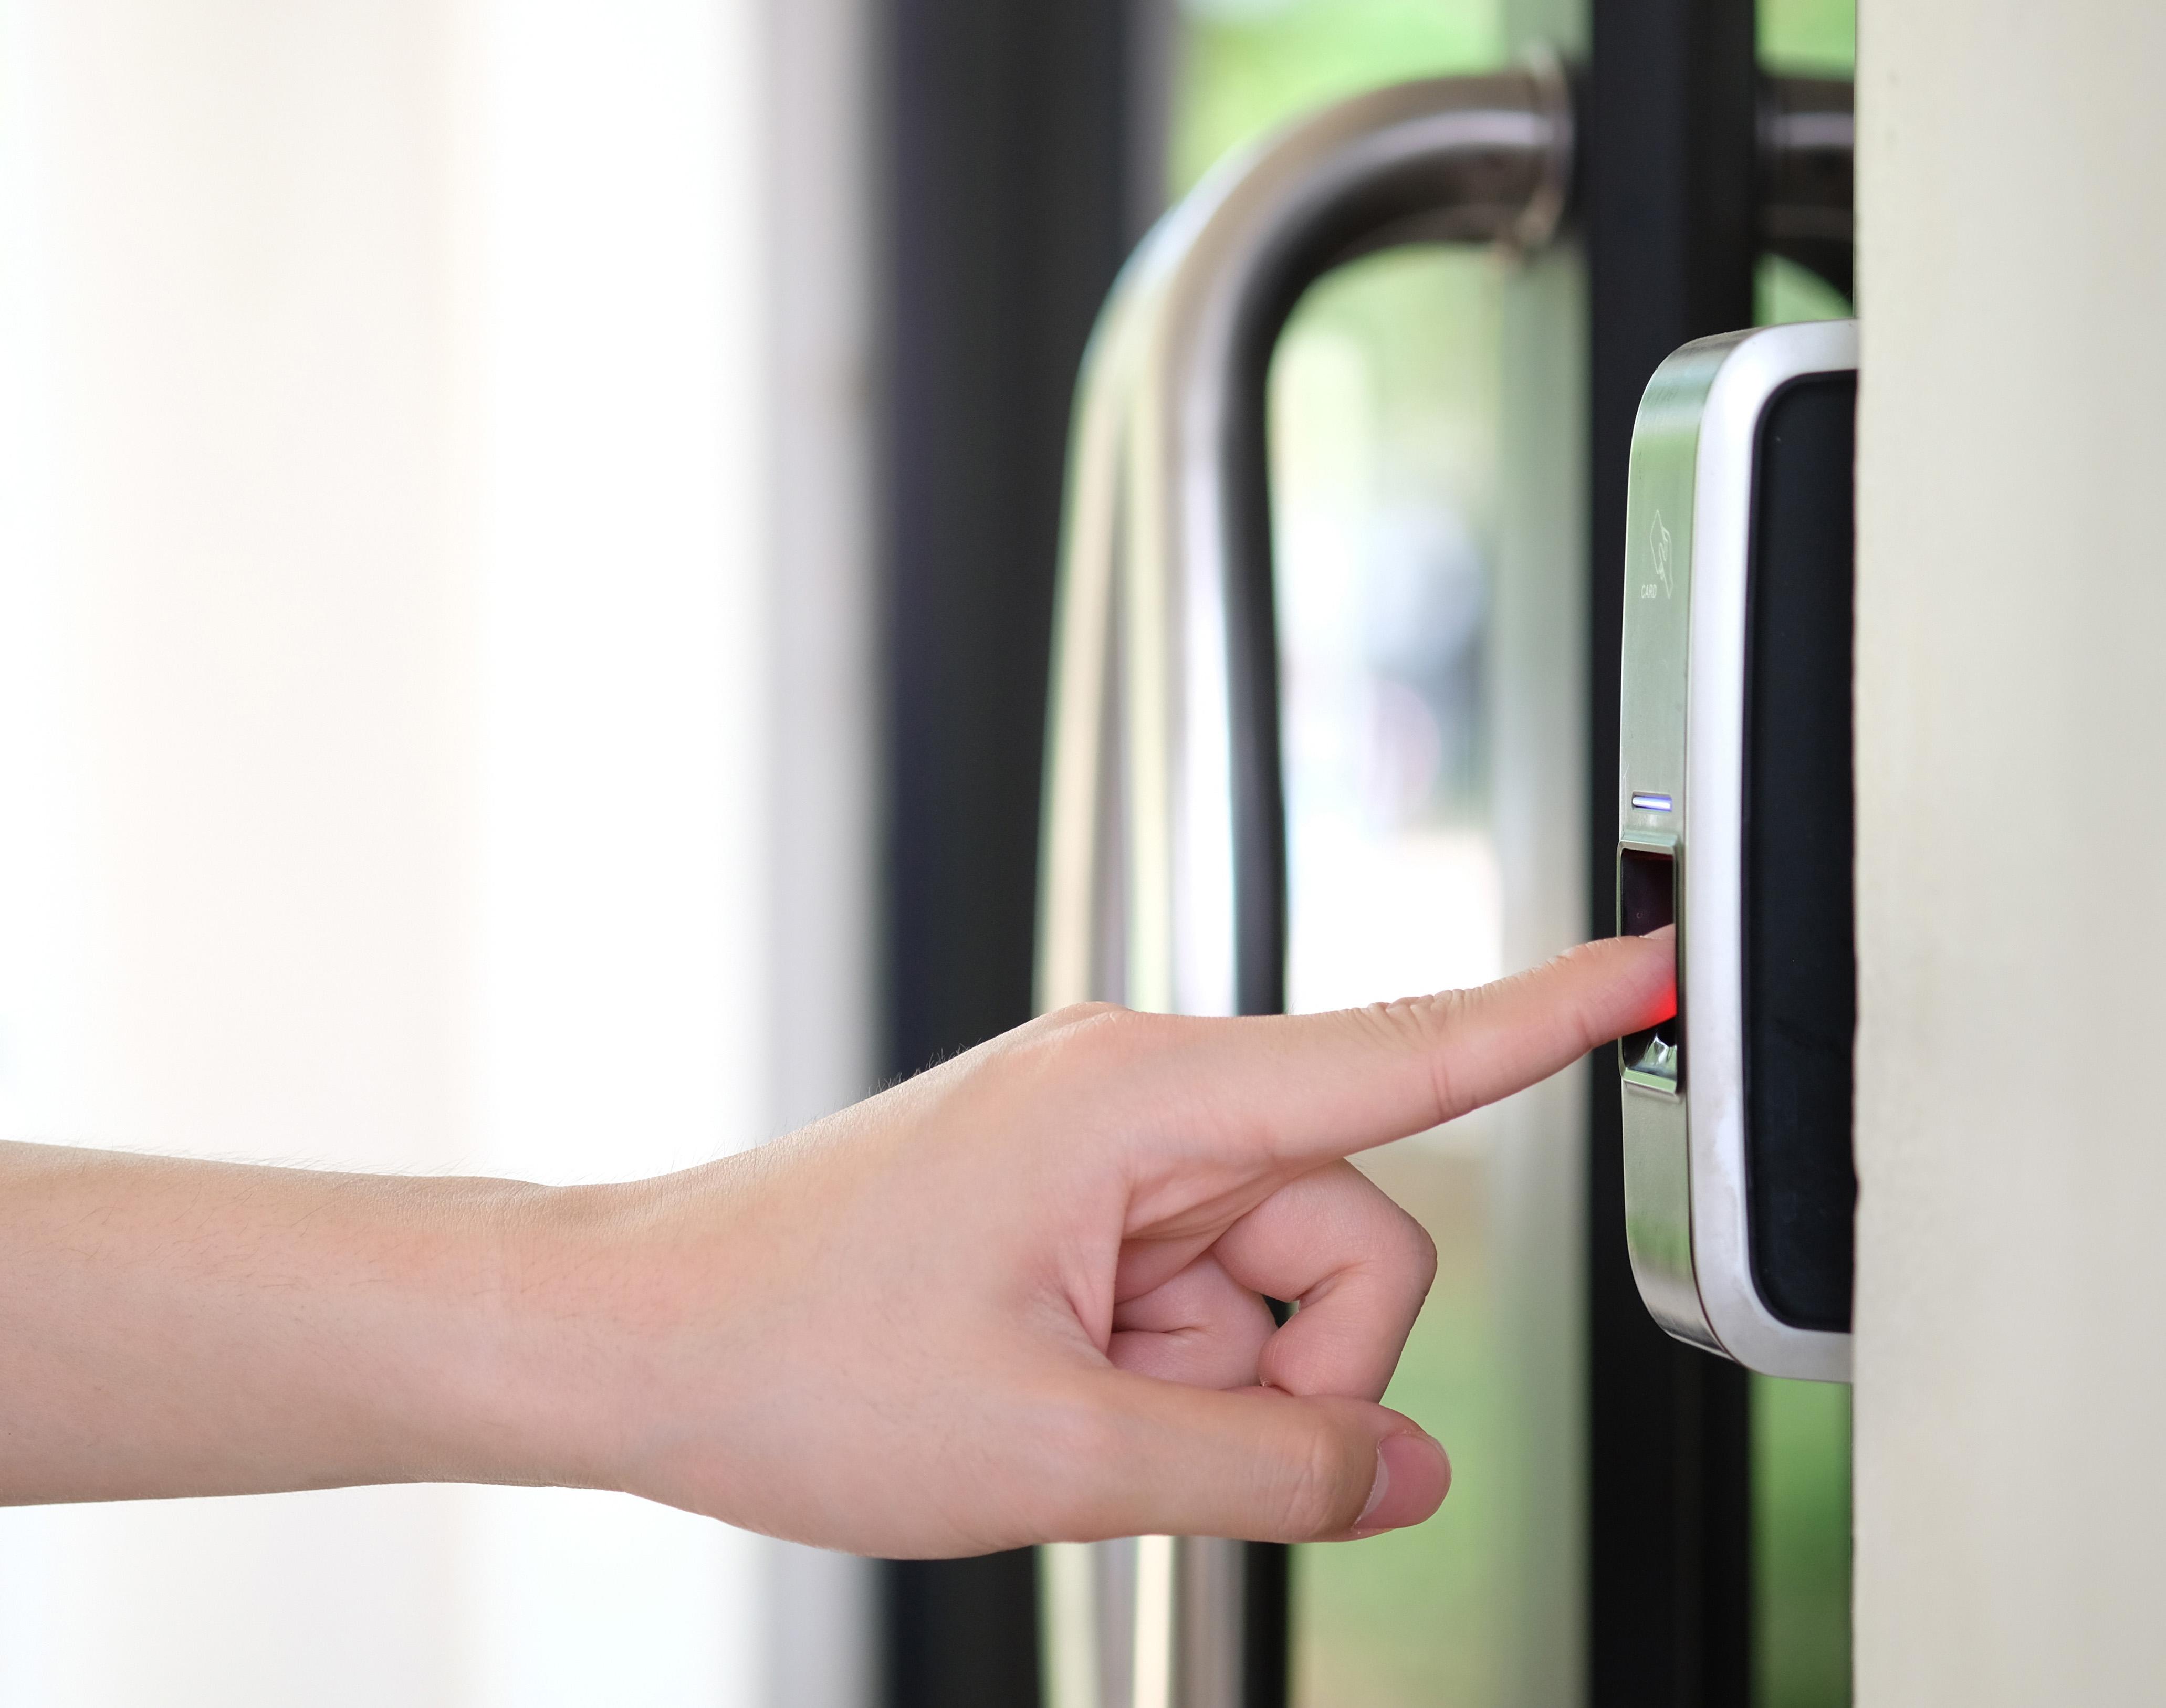 Finger Biometric Security at Sanctuary Doral